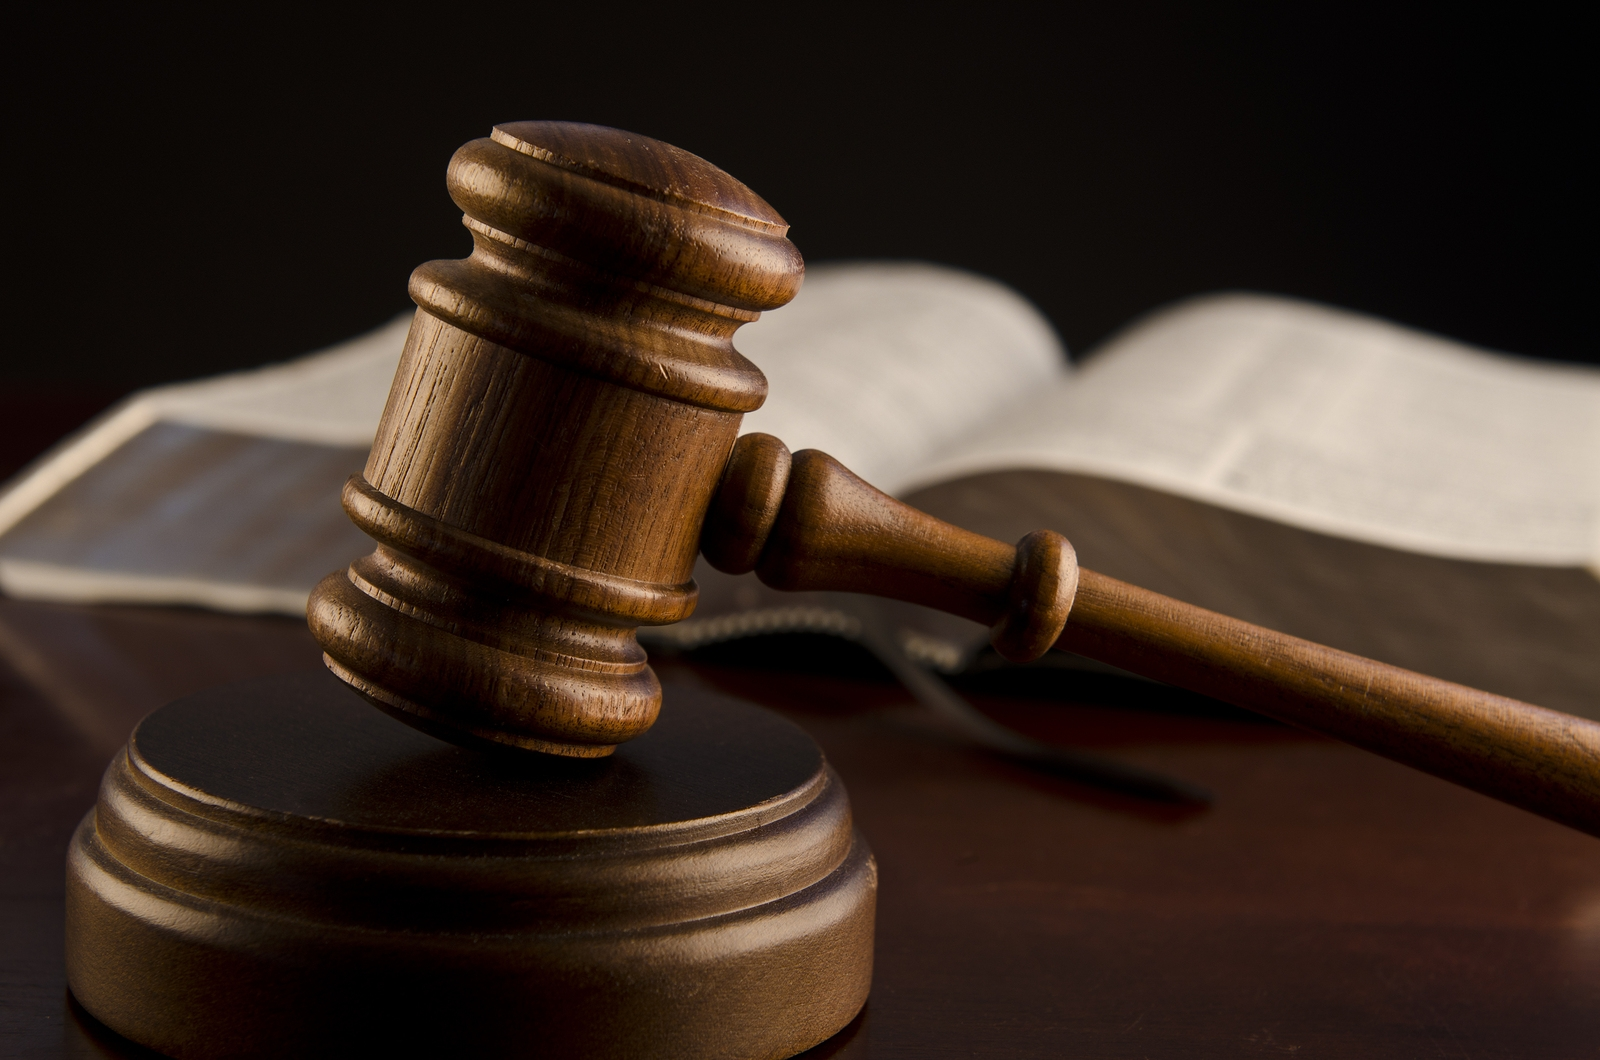 wooden-judges-gavel_306811